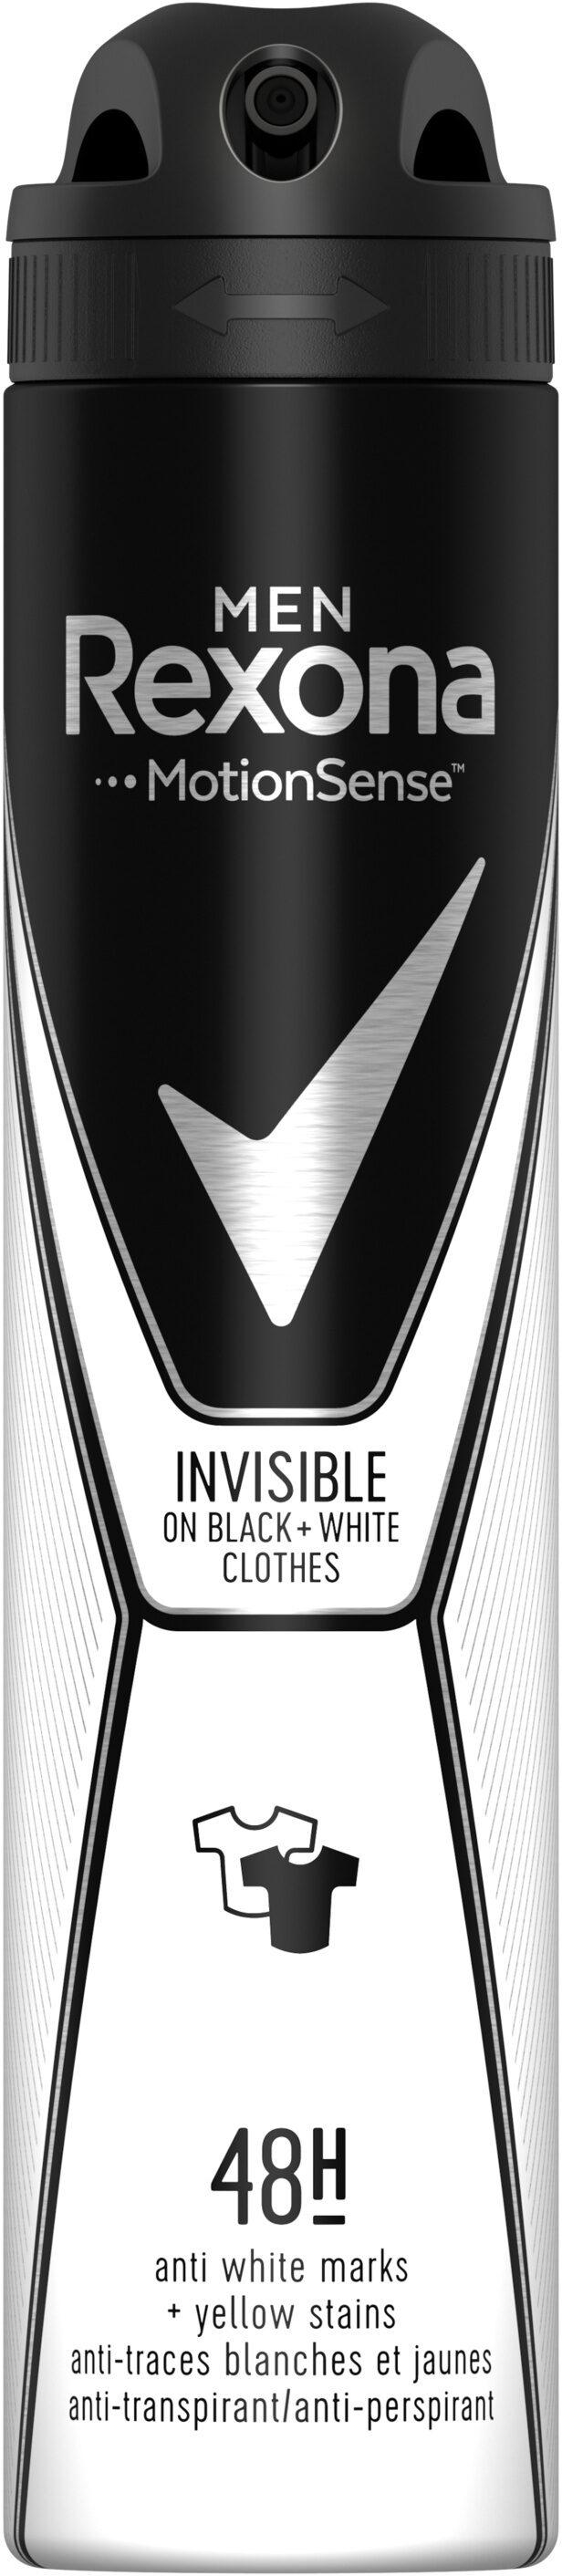 REXONA MEN Anti-Transpirant Invisible Black & White Spray - Product - fr